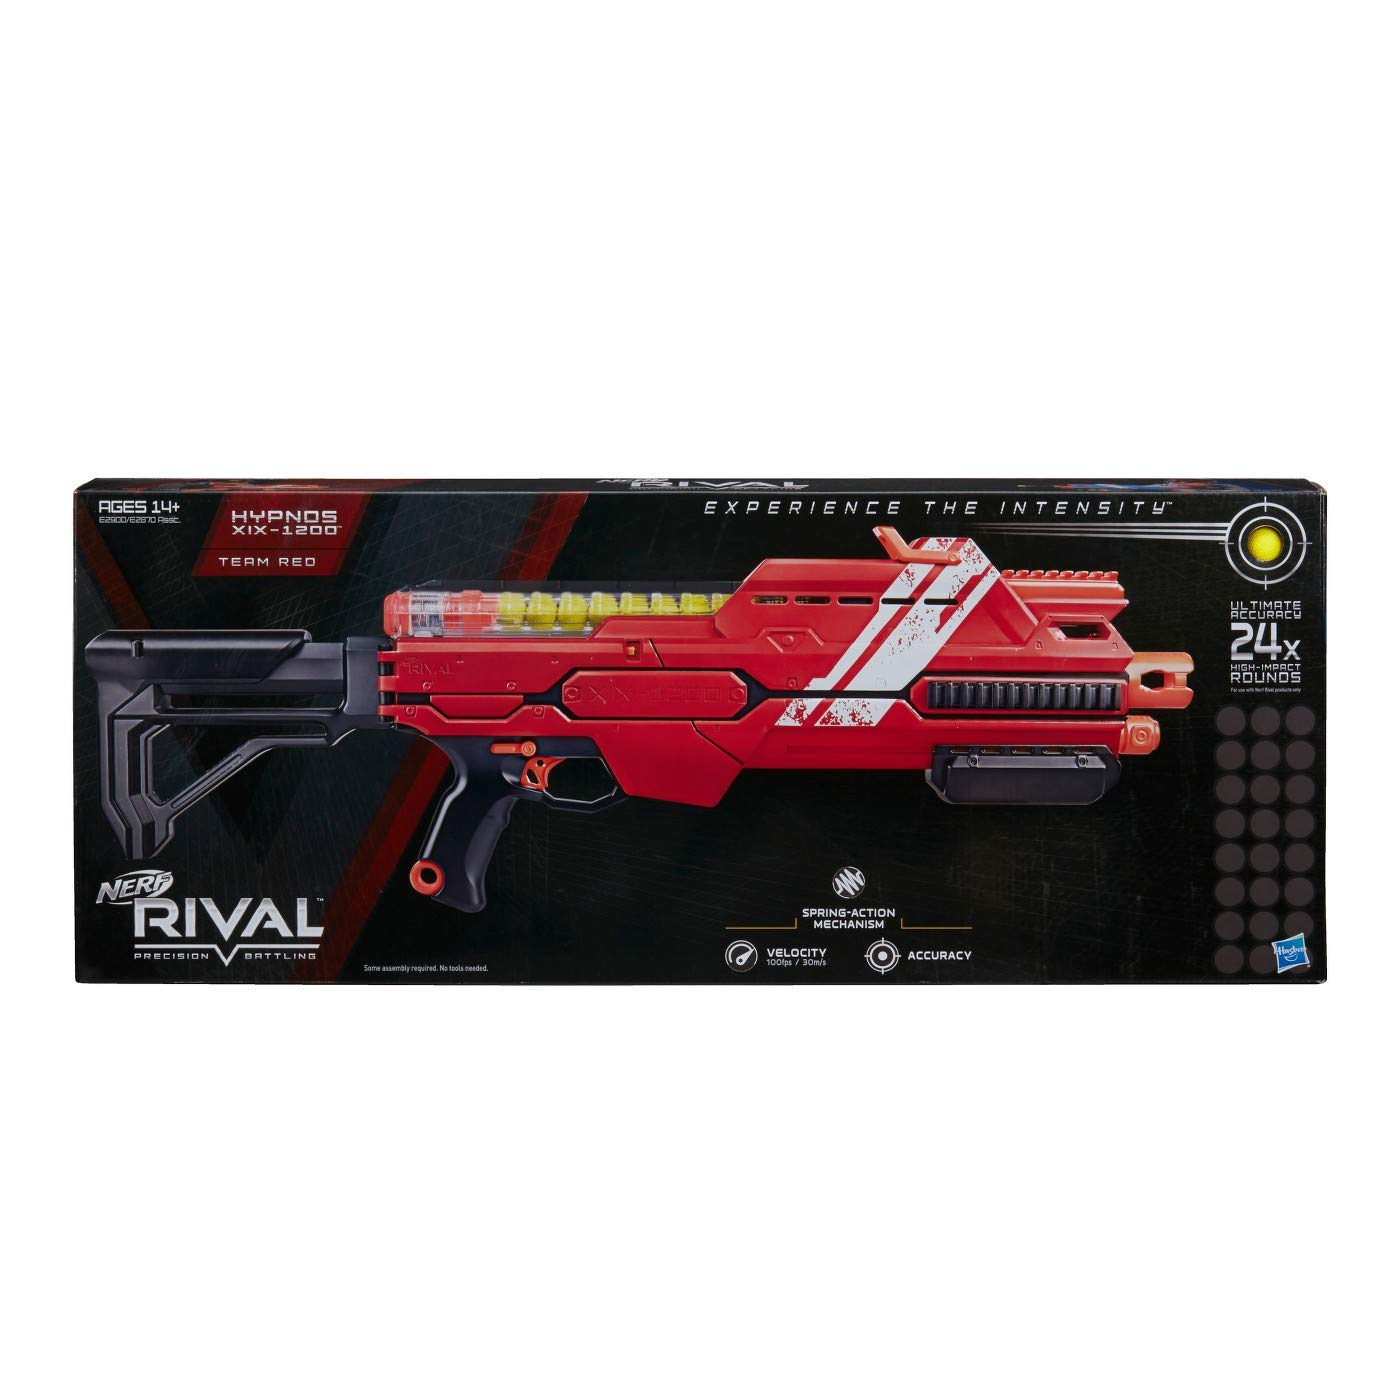 NERF Rival Hypnos XIX-1200 Red ナーフライバルヒプノスXIX-1200レッド [並行輸入品] B07MTYYXVZ